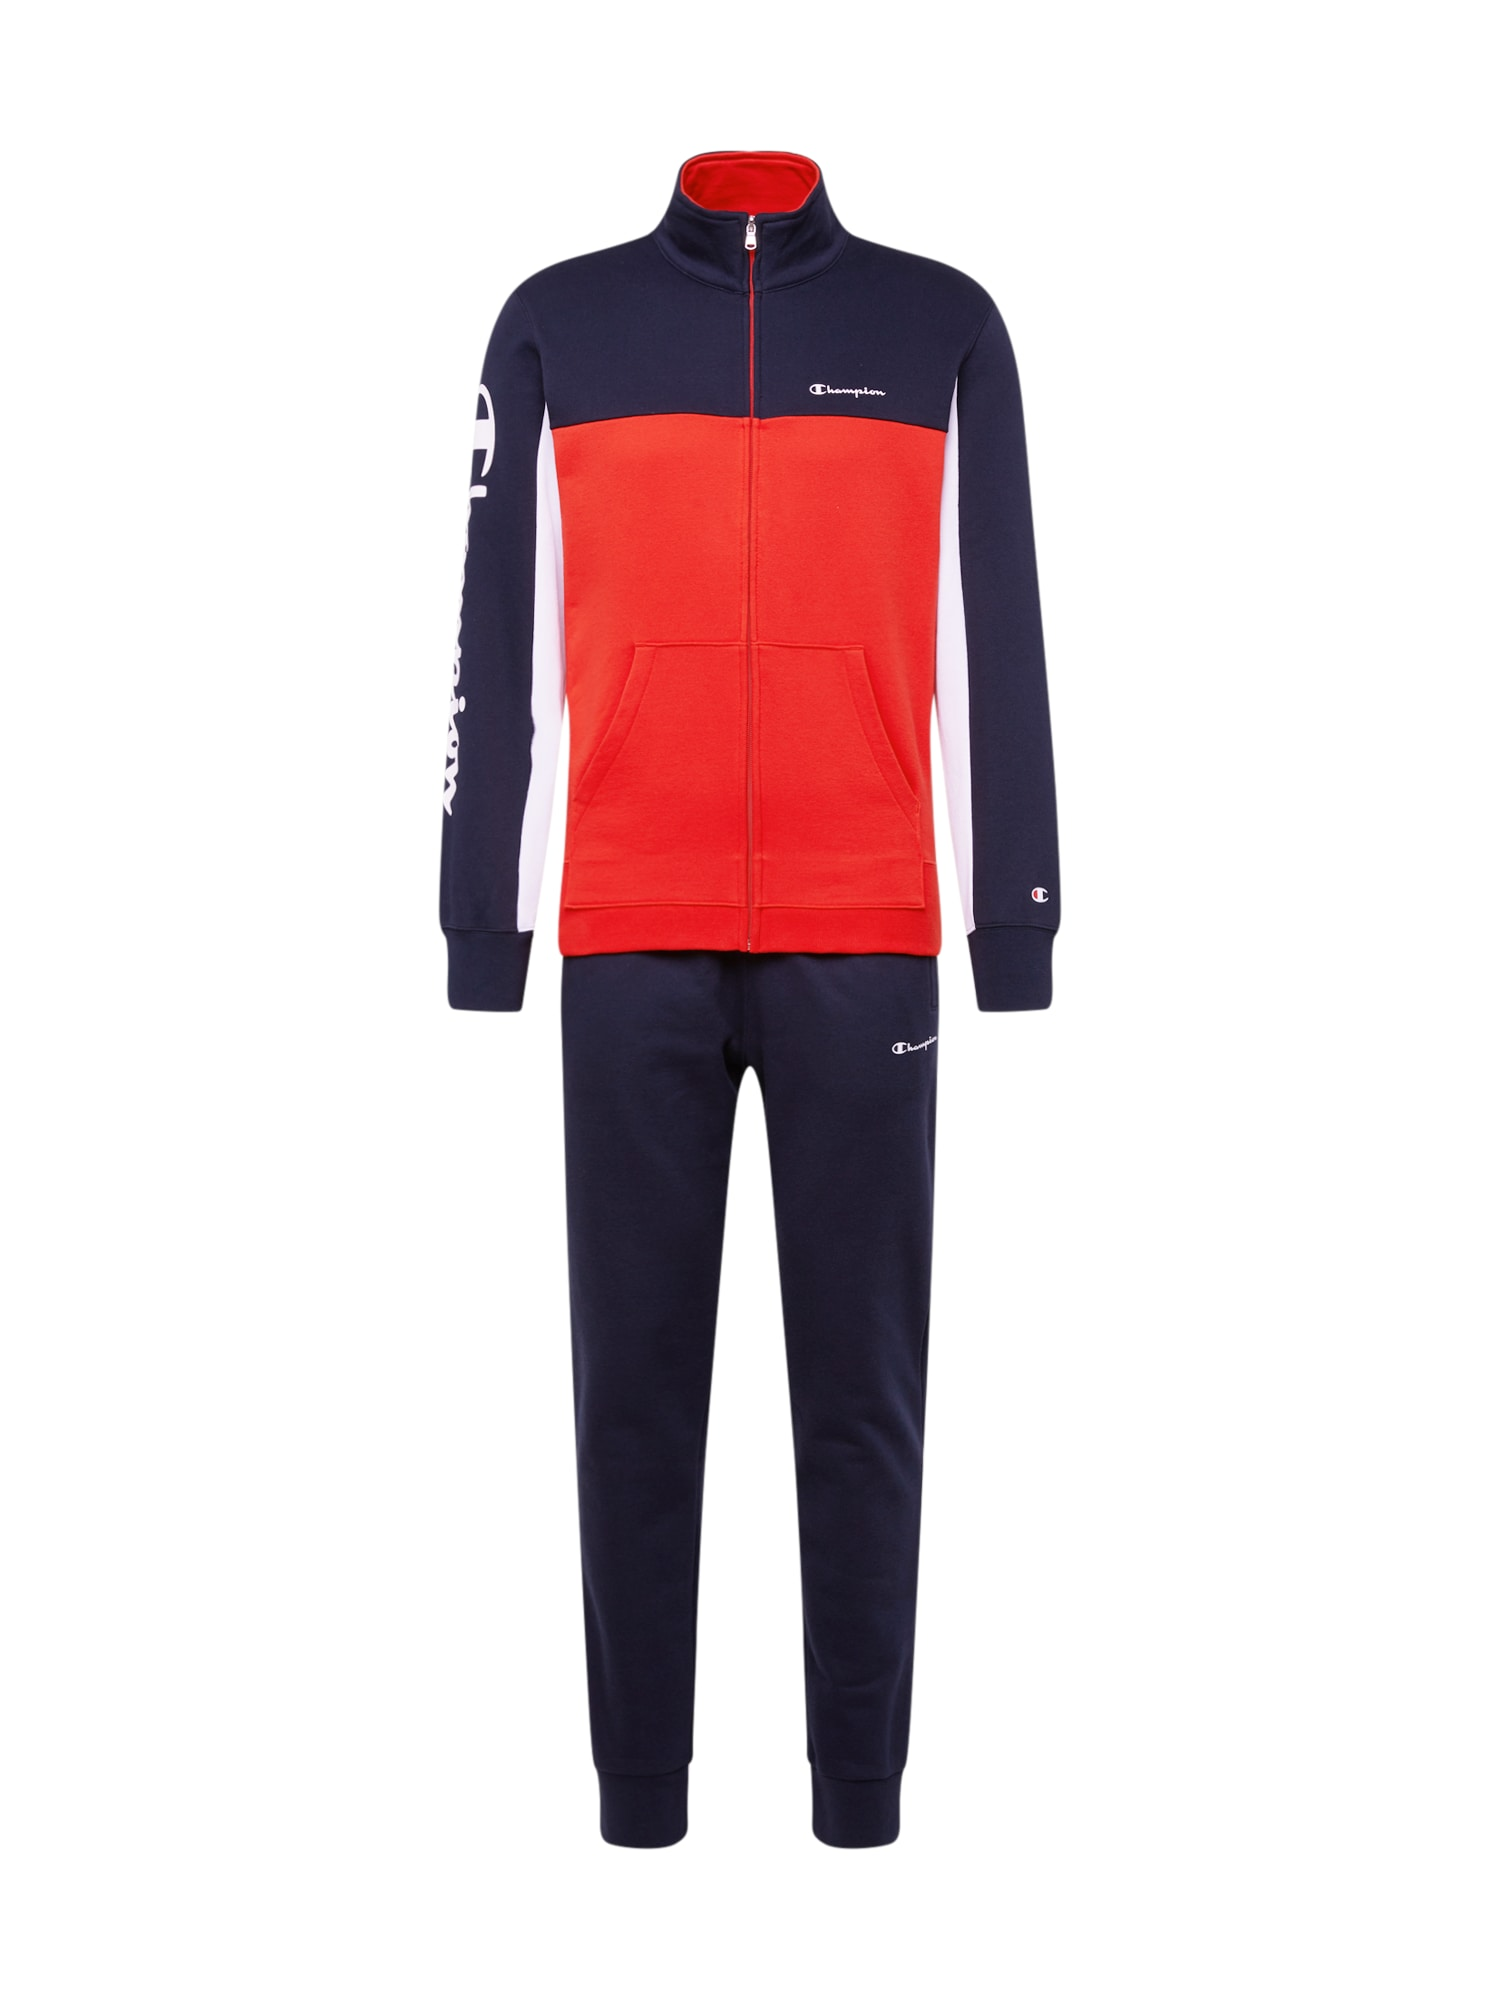 Champion Authentic Athletic Apparel Naminis kostiumas 'Full Zip Suit' tamsiai mėlyna / raudona / balta